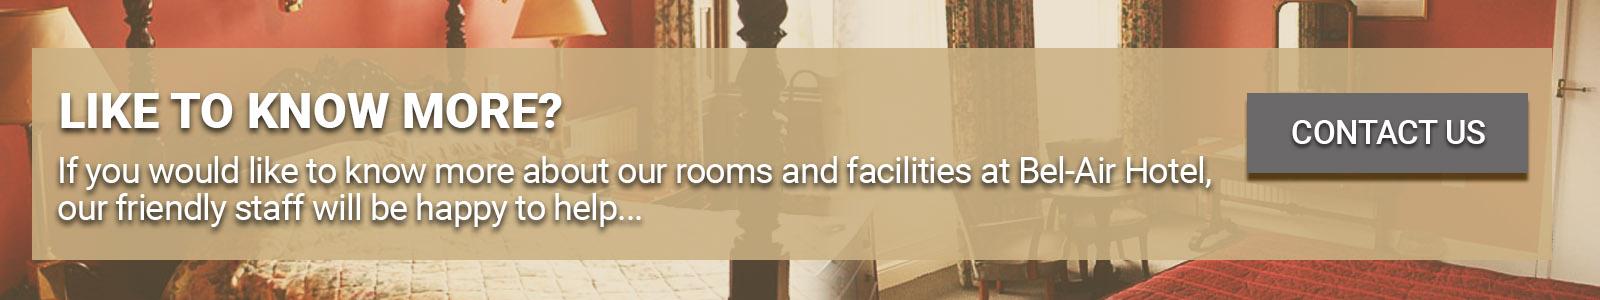 Bel-Air Hotel Rooms